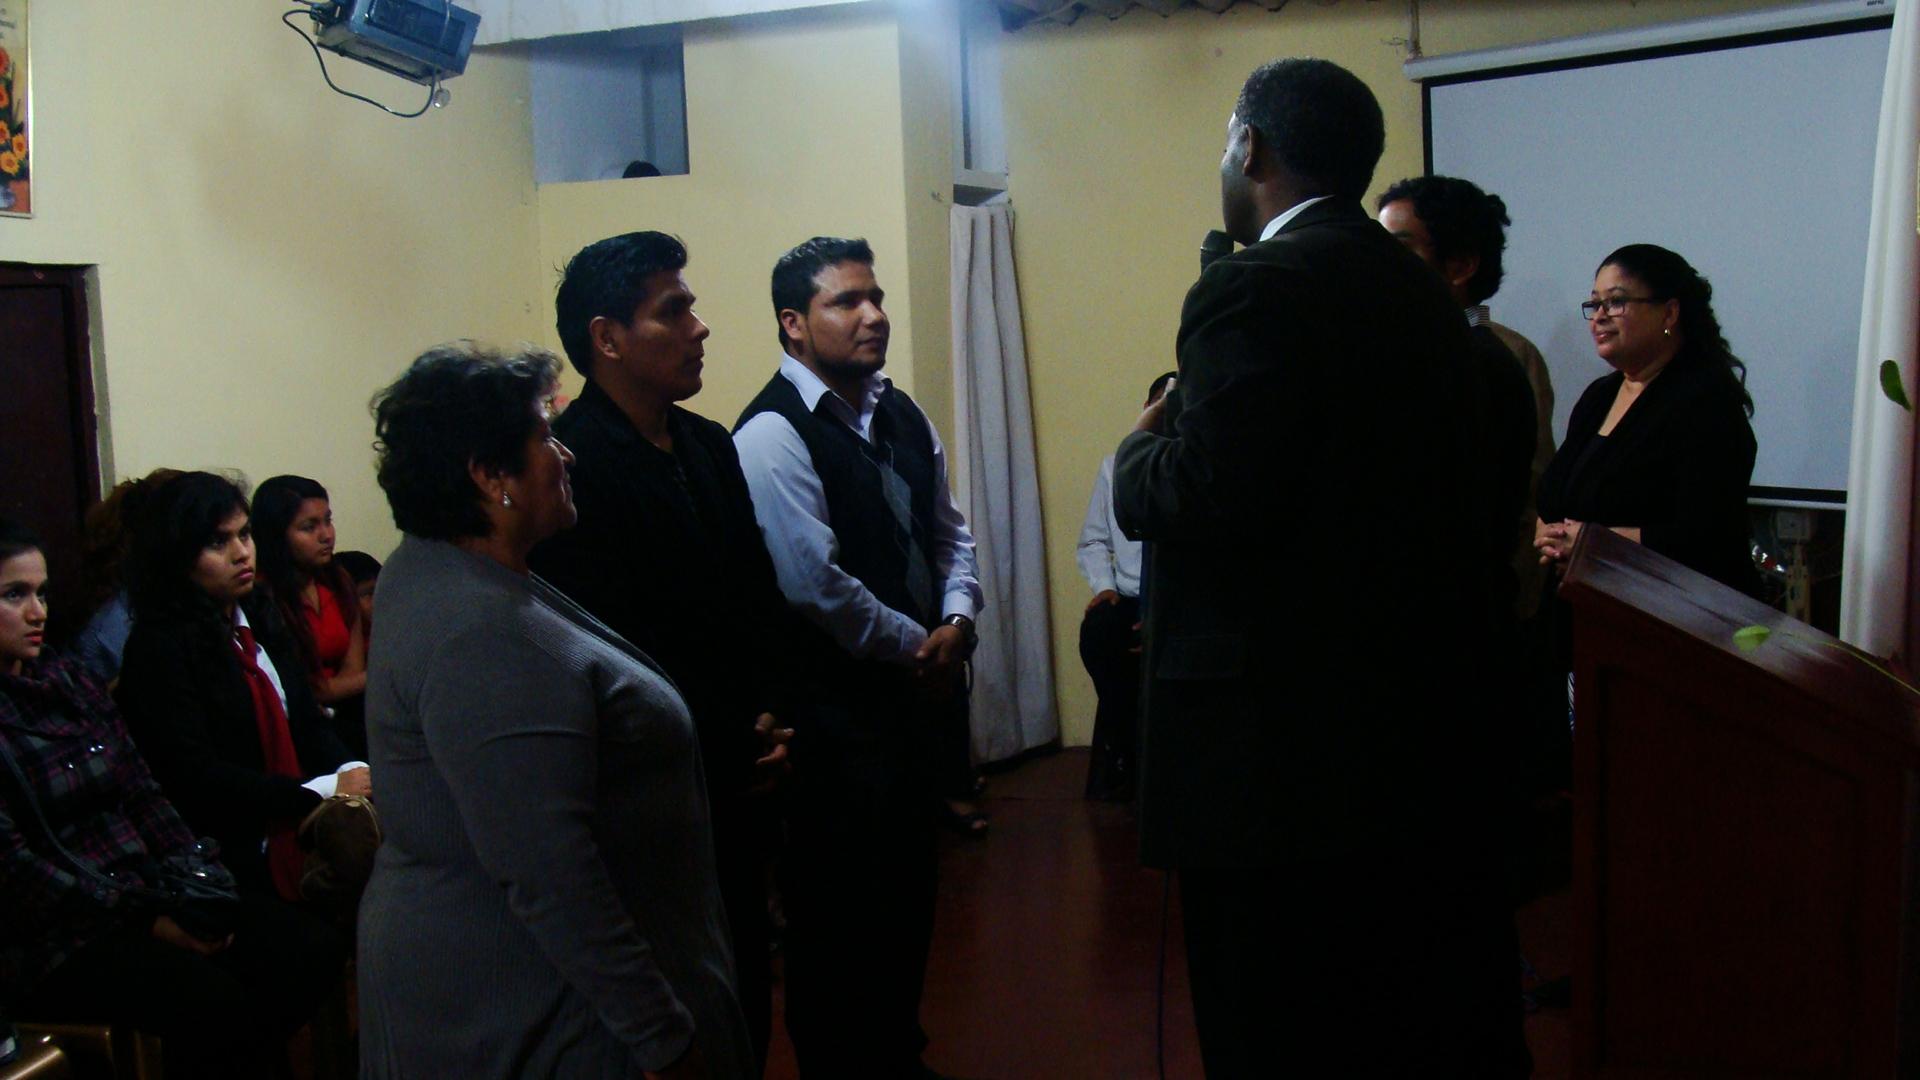 Local Pastors in attendance